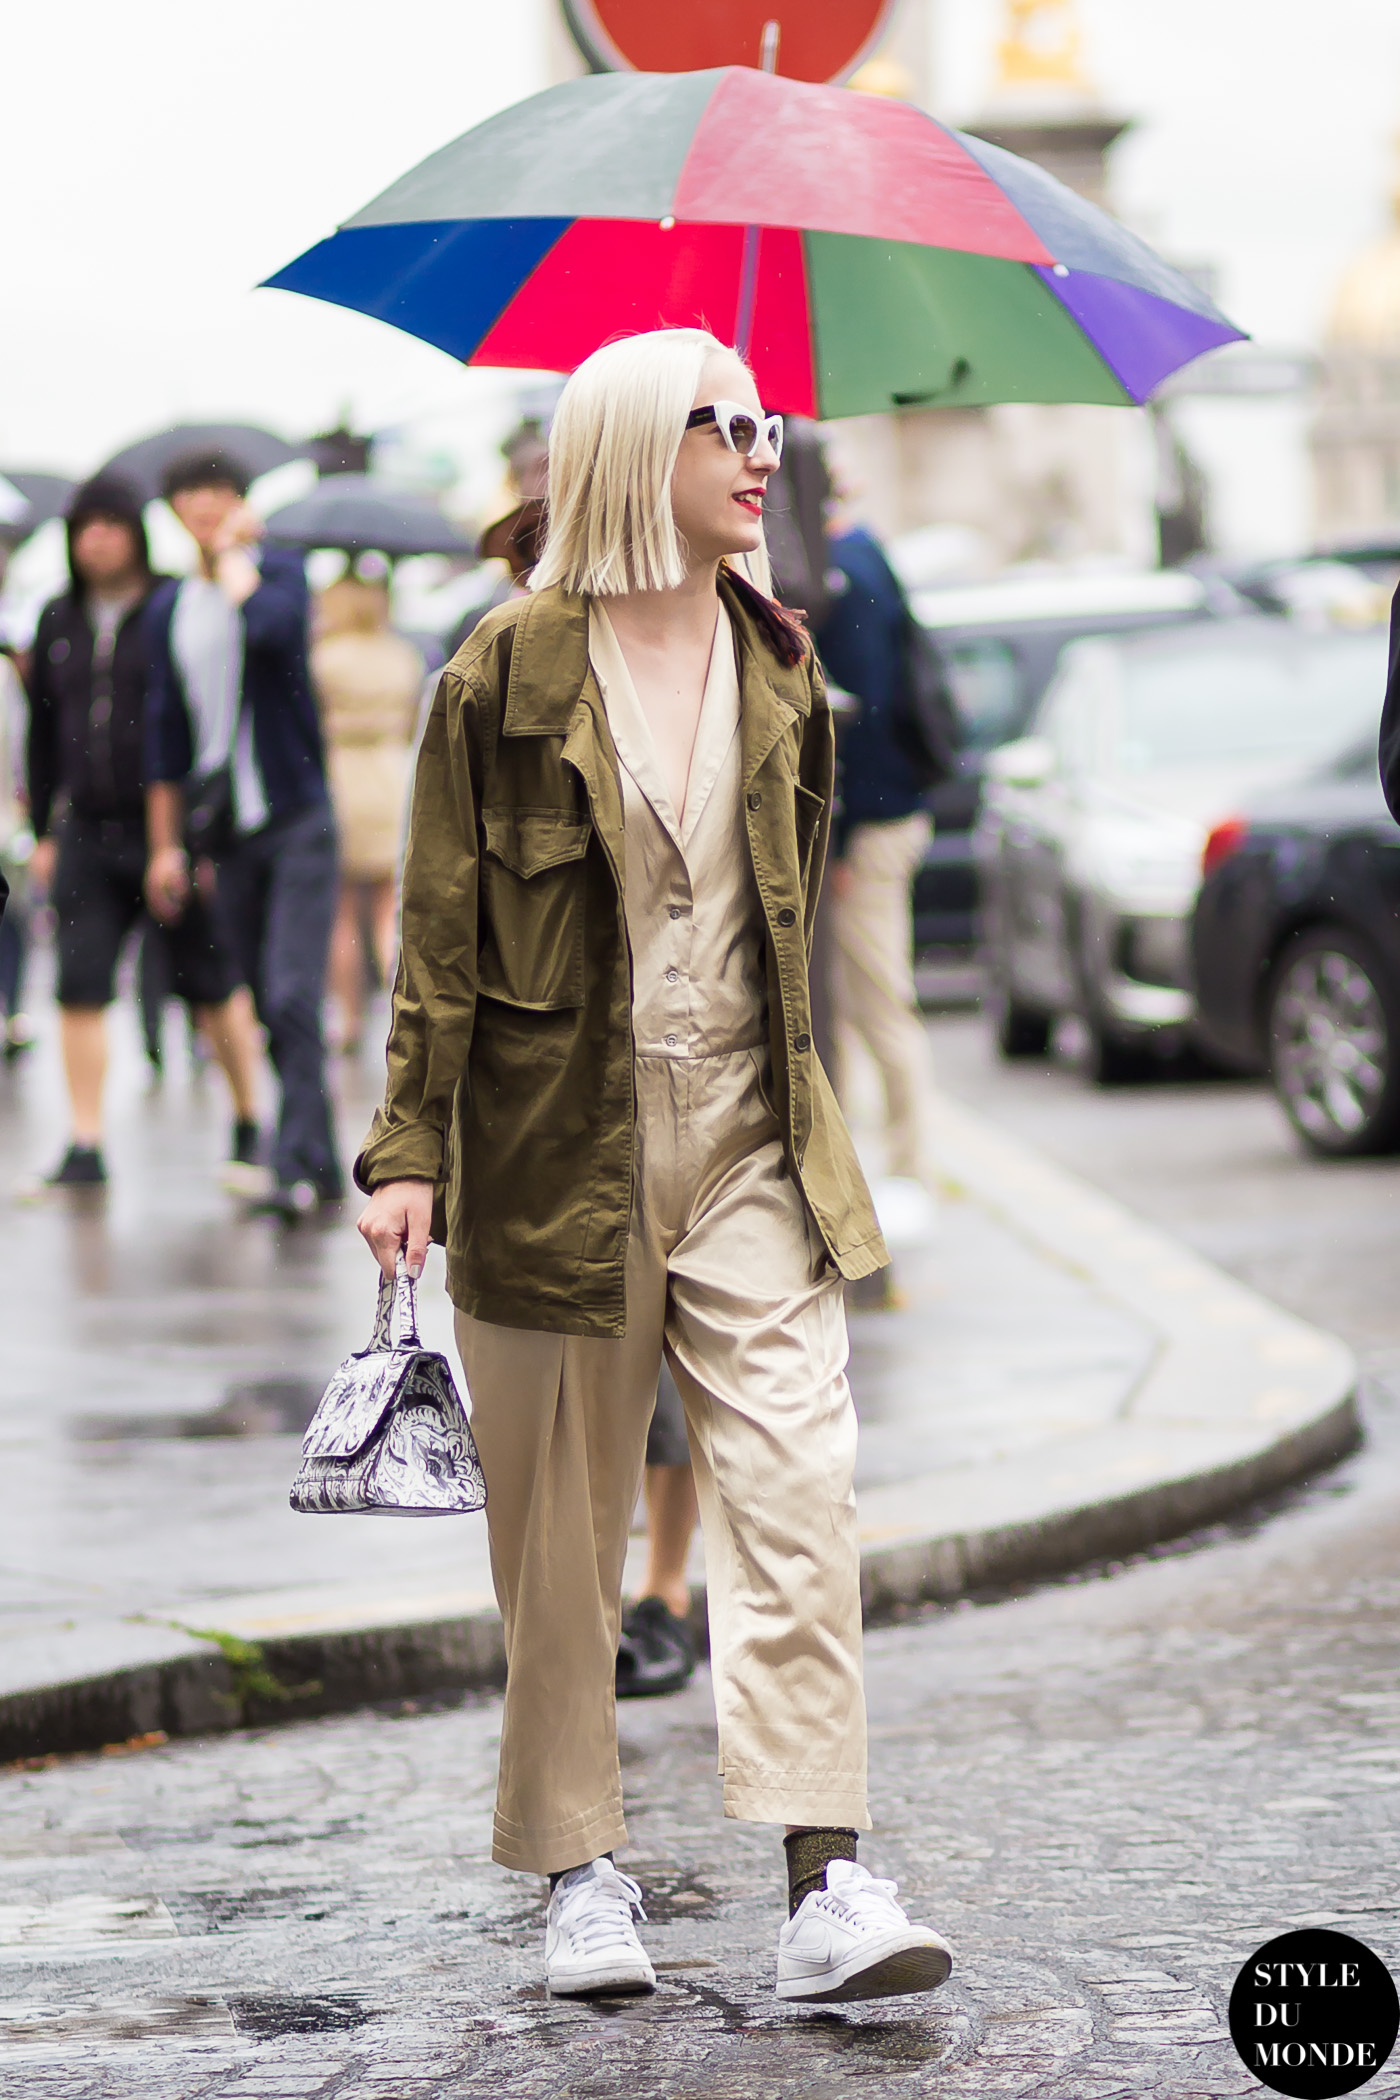 b1ded37765e Elena Psalti Street Style Street Fashion Streetsnaps by STYLEDUMONDE Street  Style Fashion Blog